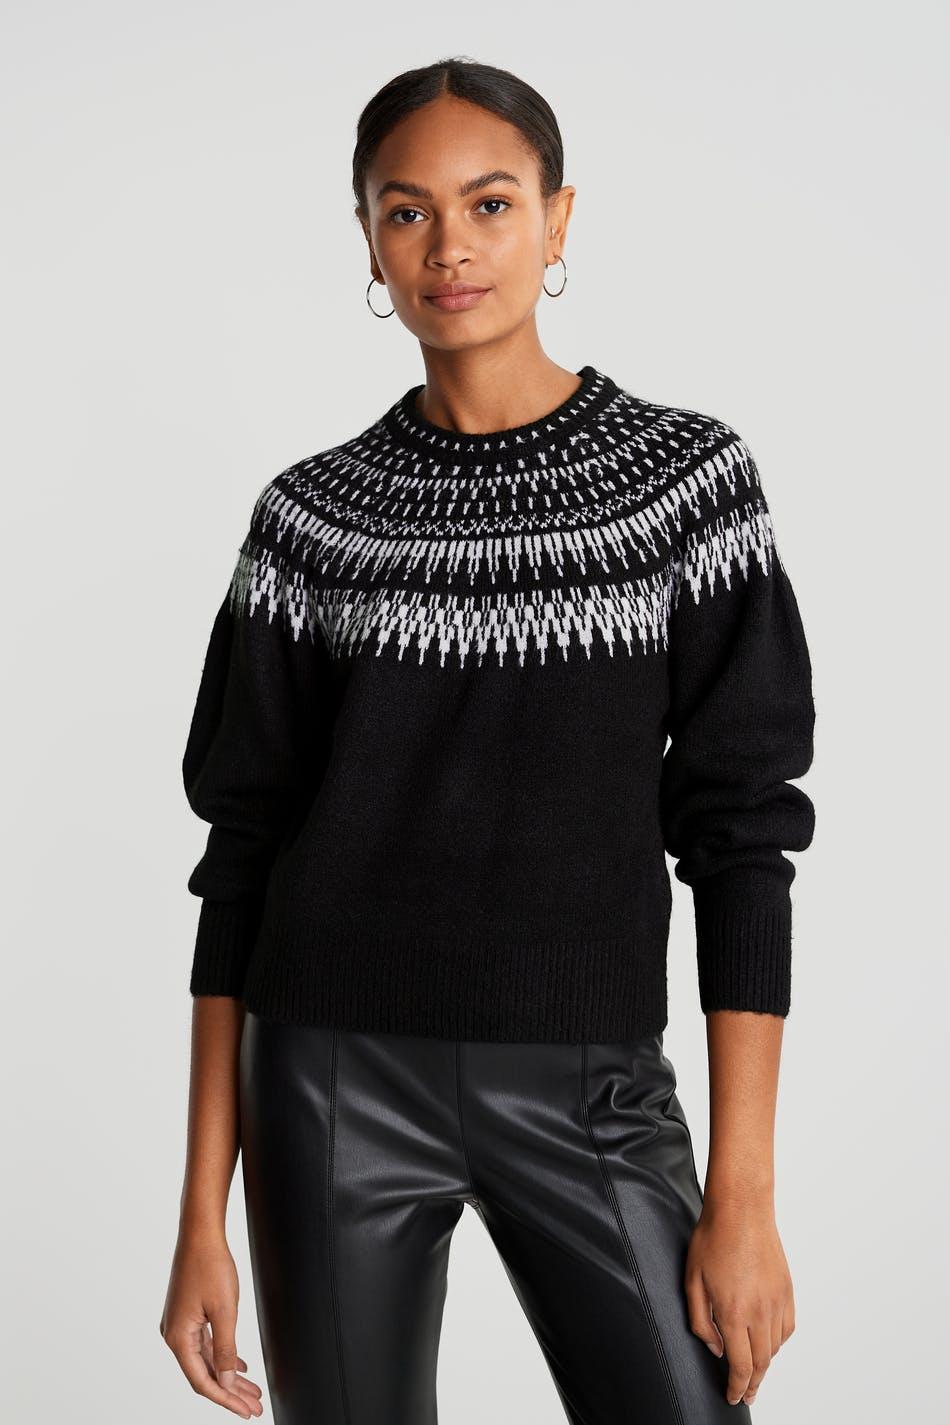 Klara knitted sweater